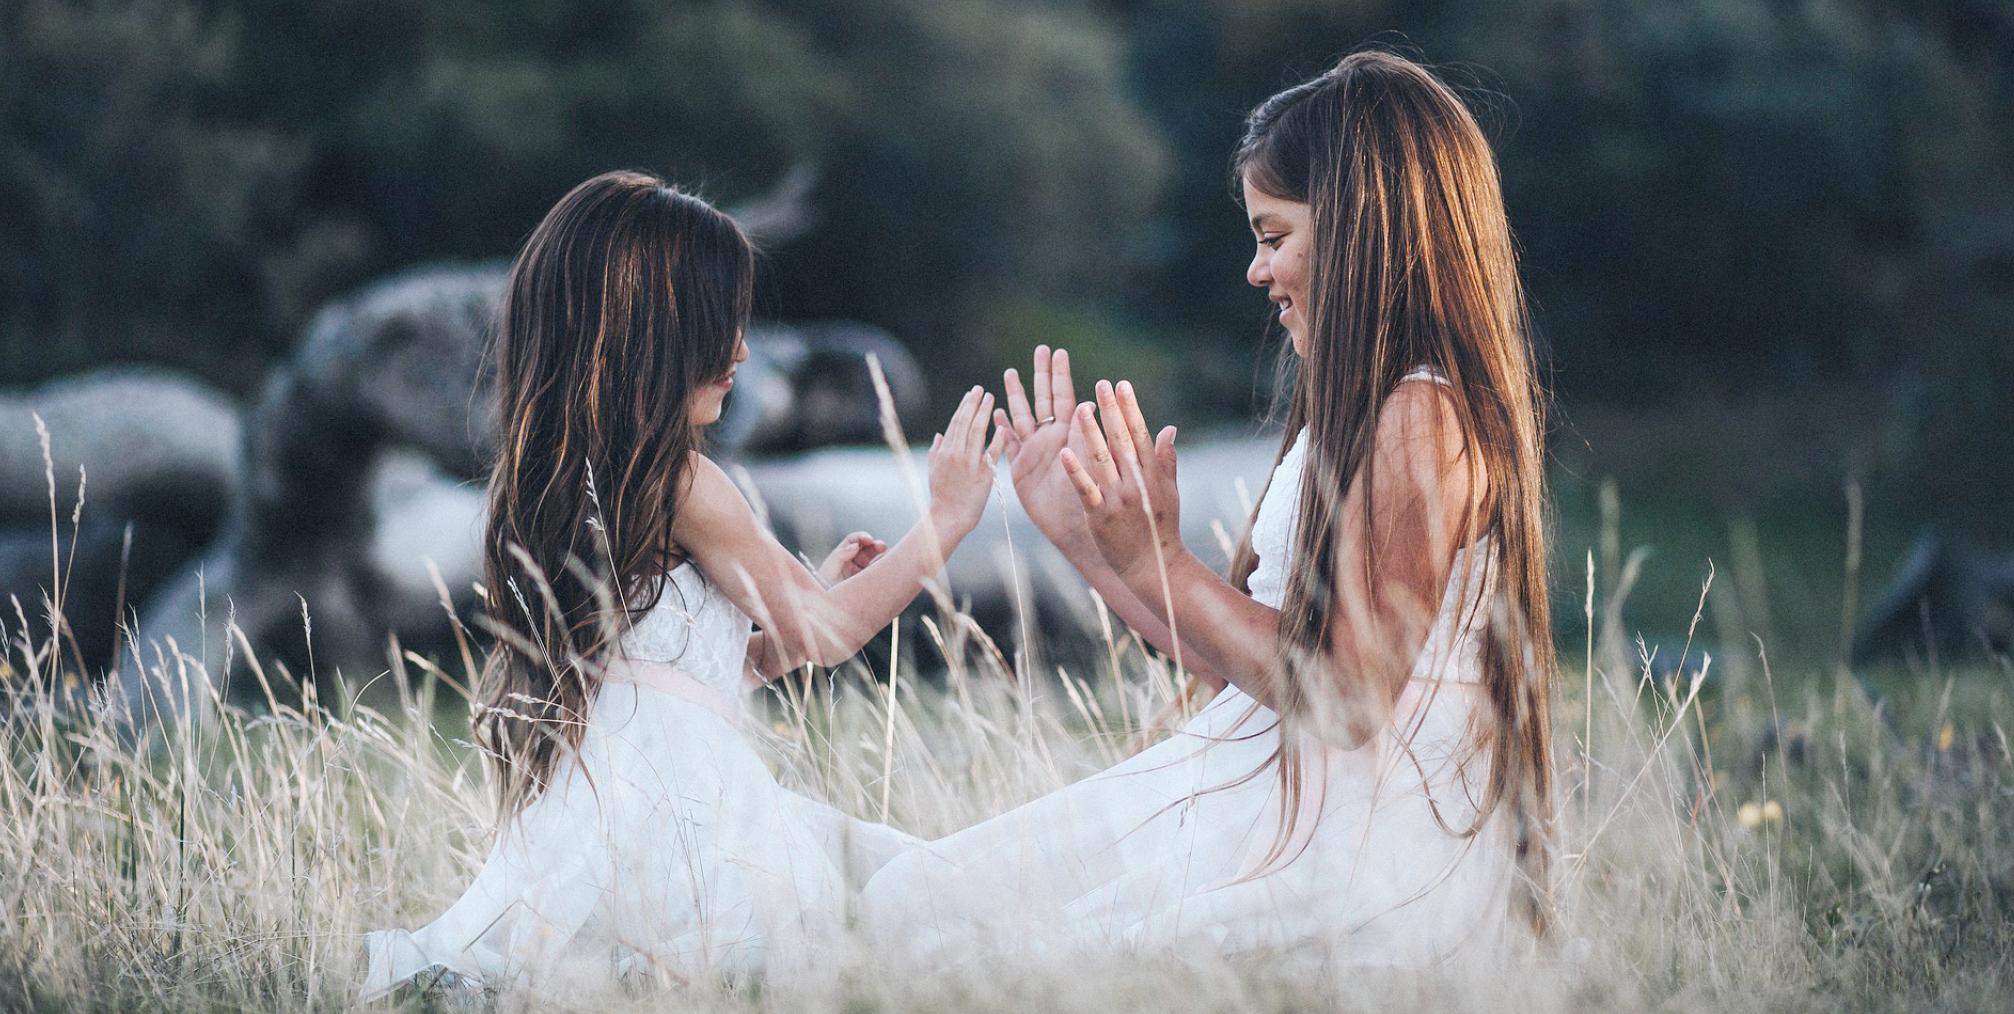 Barn i bryllup bryllupsfest aktiviteter for barna bryllupsplanlegging bryllupstips bryllupsblogg